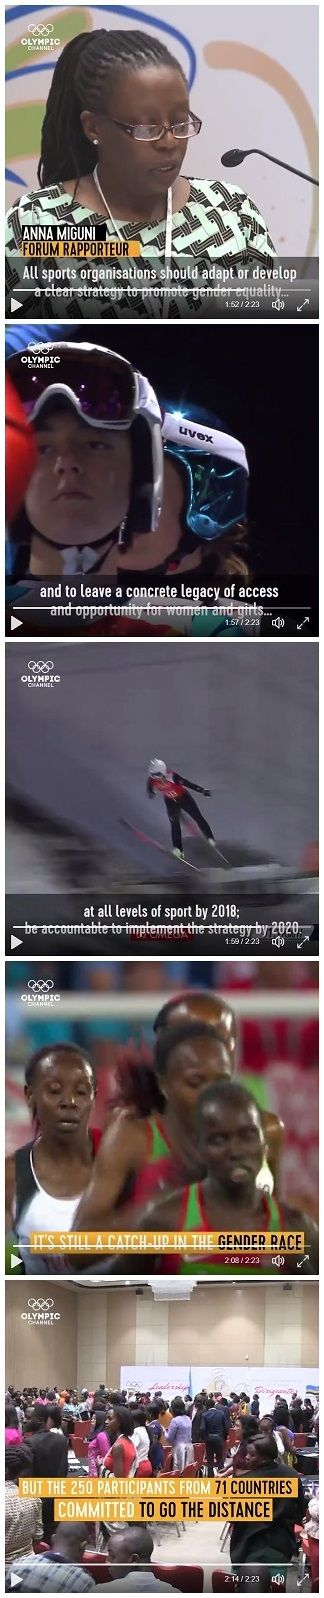 IOCequal50 5